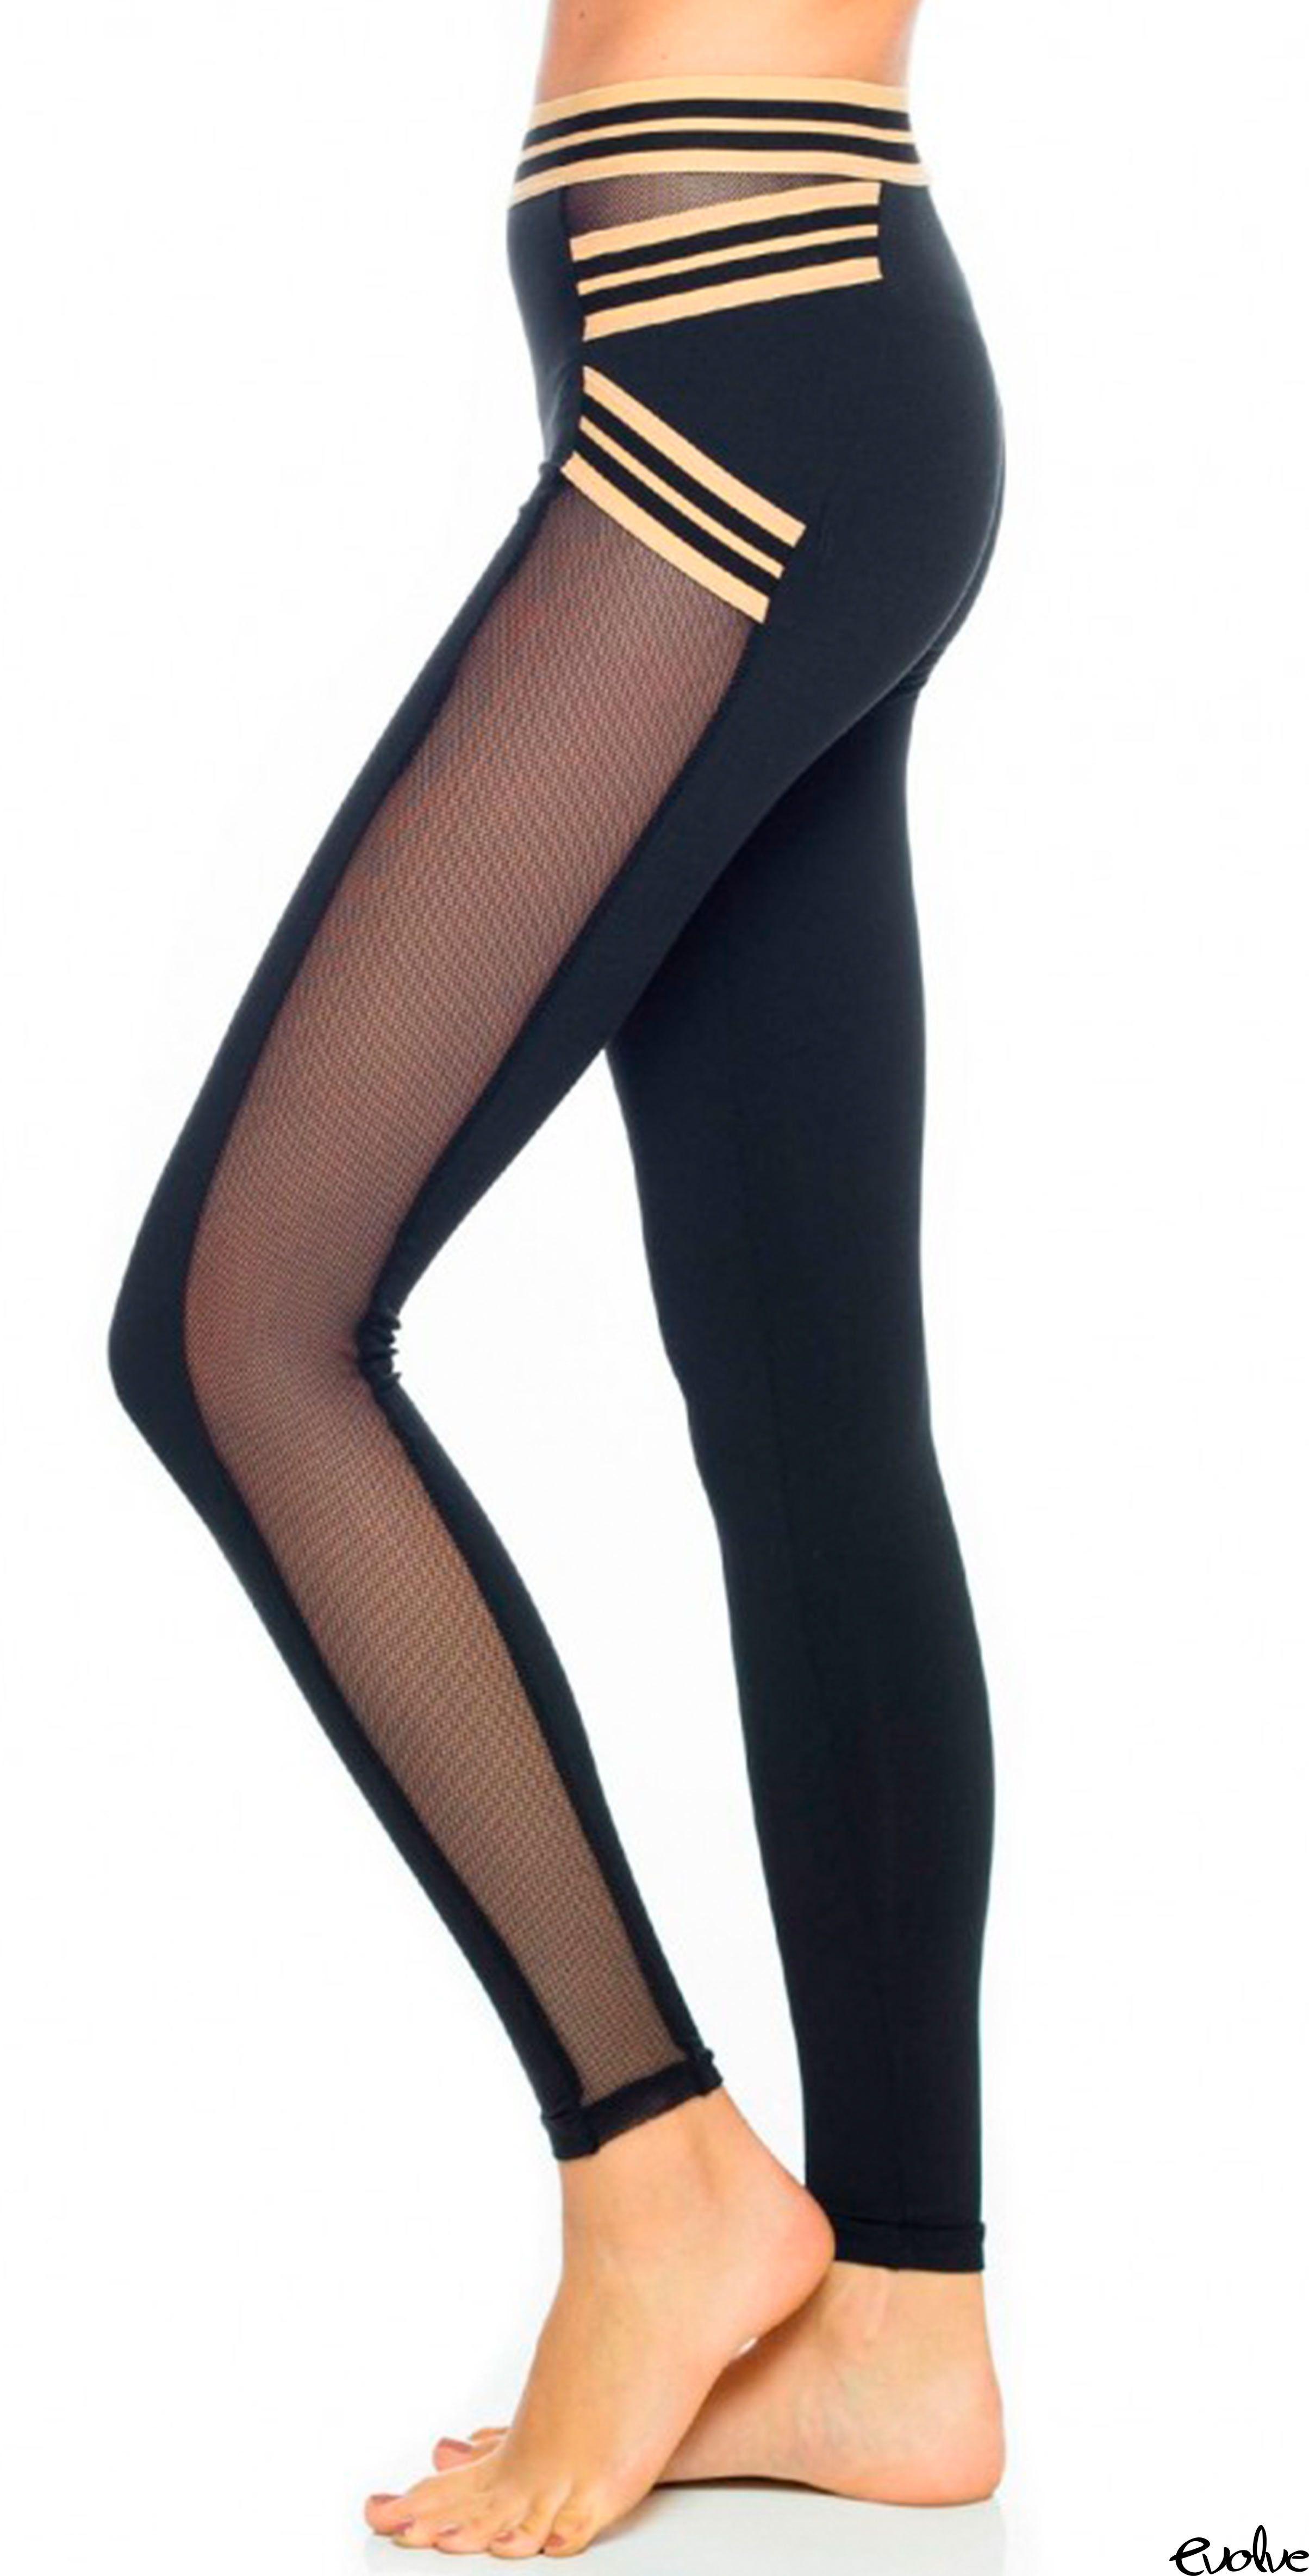 37bb97530e370 Blue Life Fit Sporty Legging. Shop now at www.evolvefitwear.com. Ropa